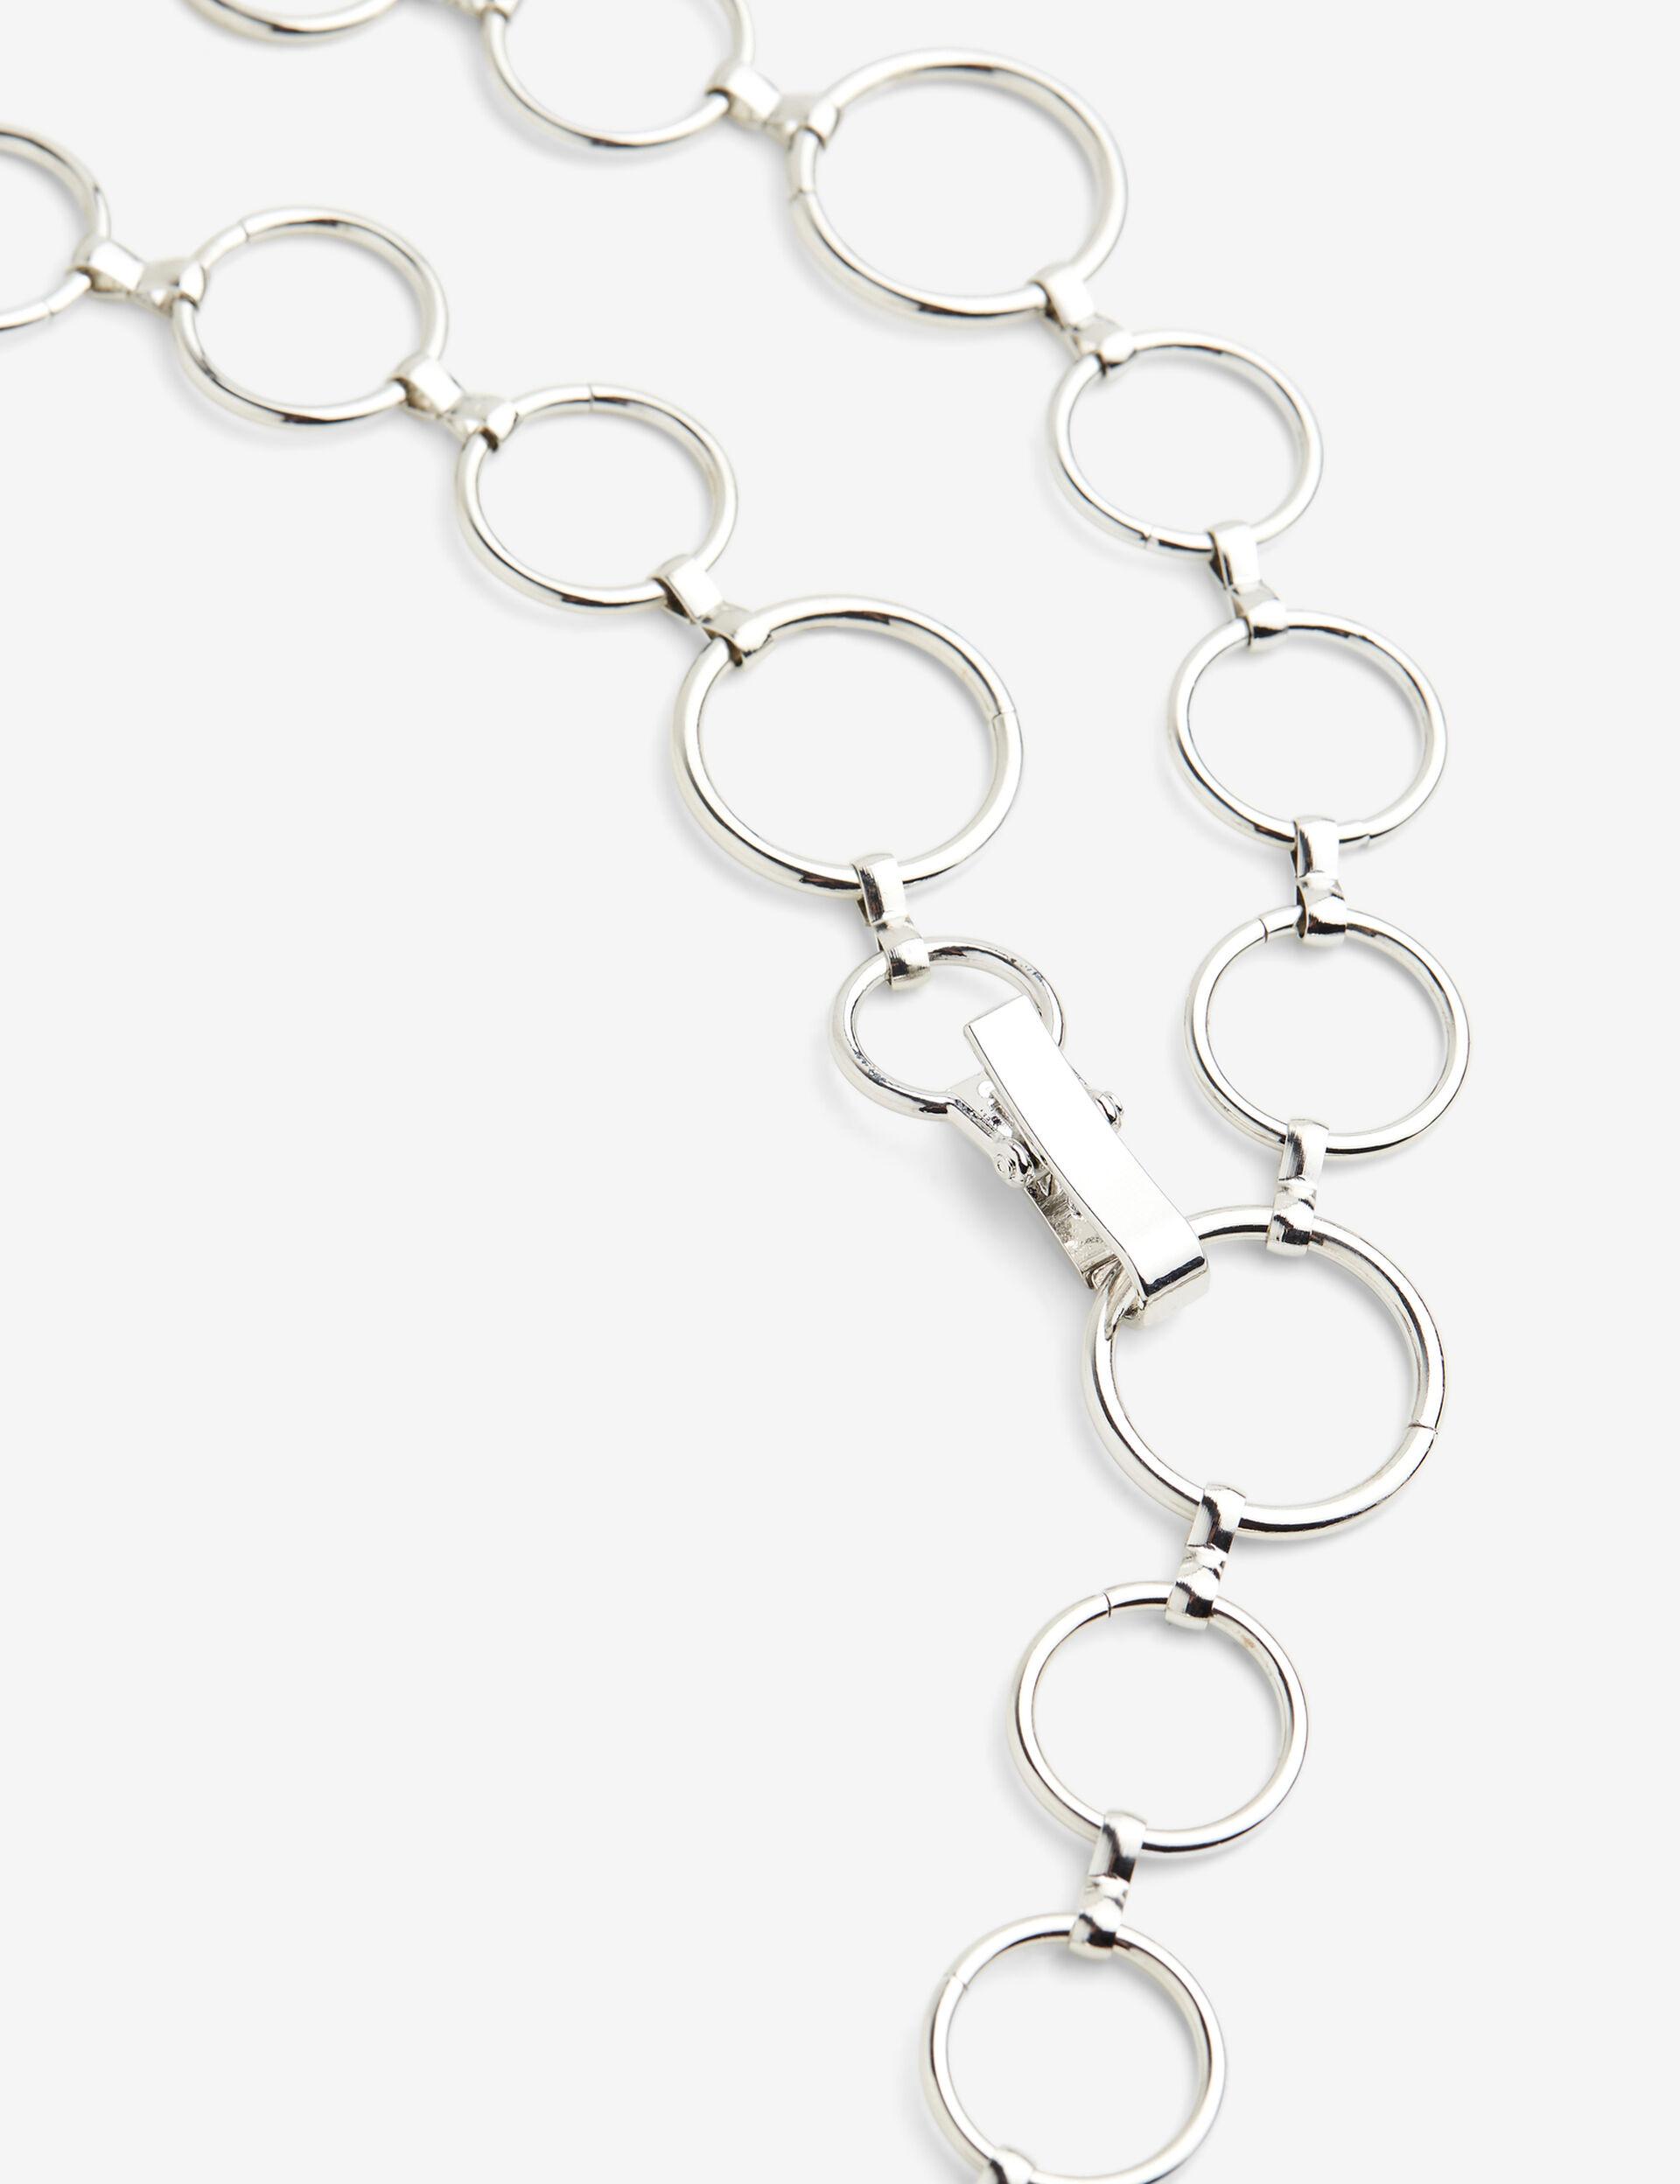 Jewel buckle belt